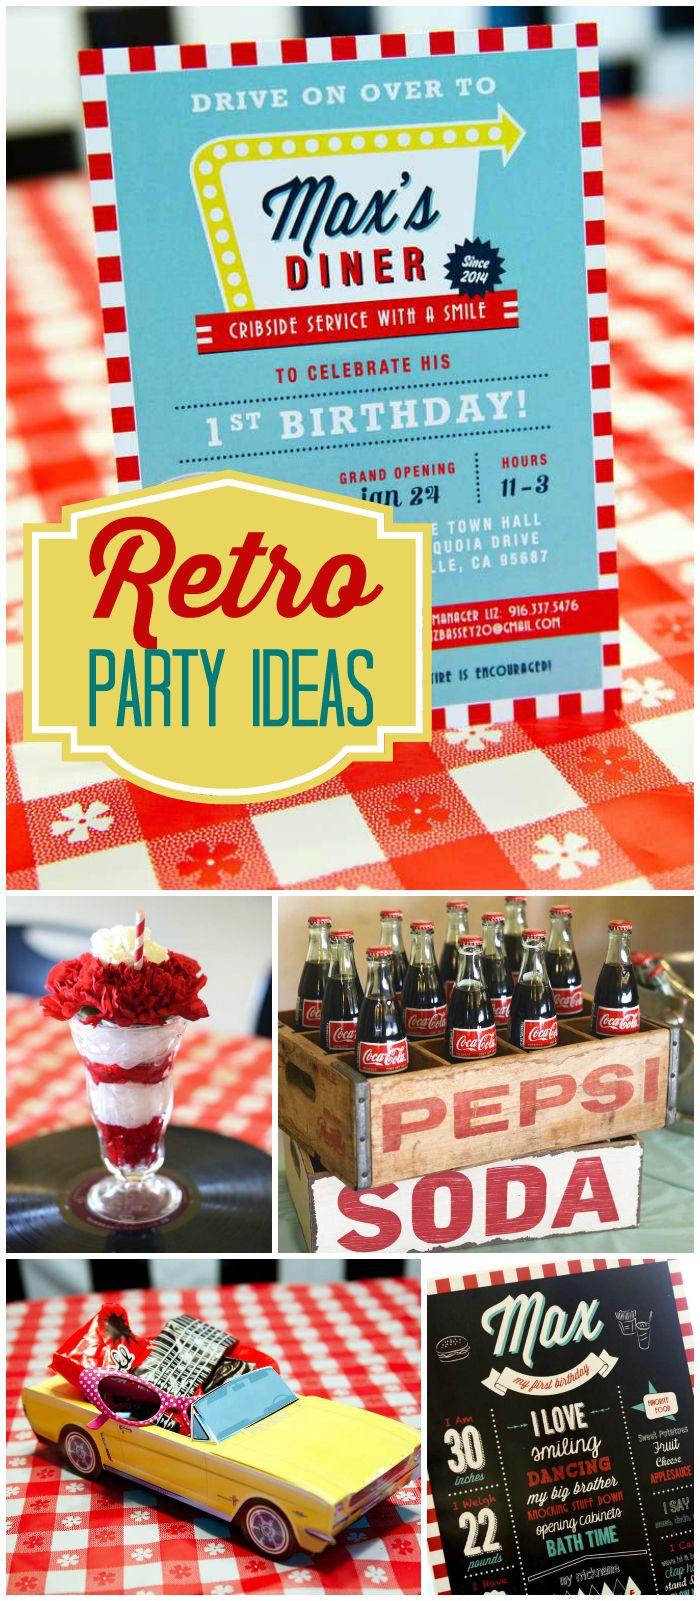 Best 258 50s diner party ideas on Pinterest | Birthdays, Parties ...